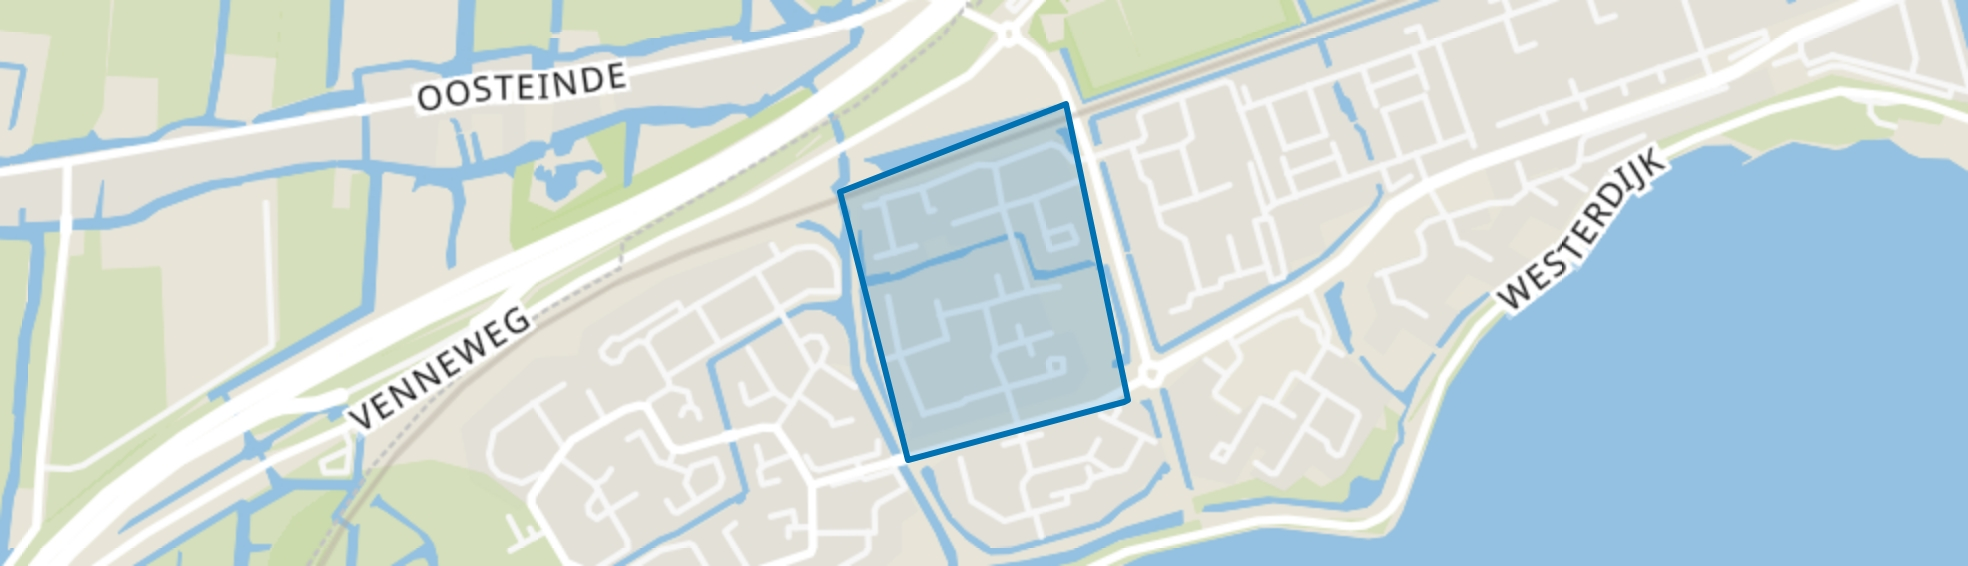 Grote Waal - Buurt 13 05, Hoorn (NH) map